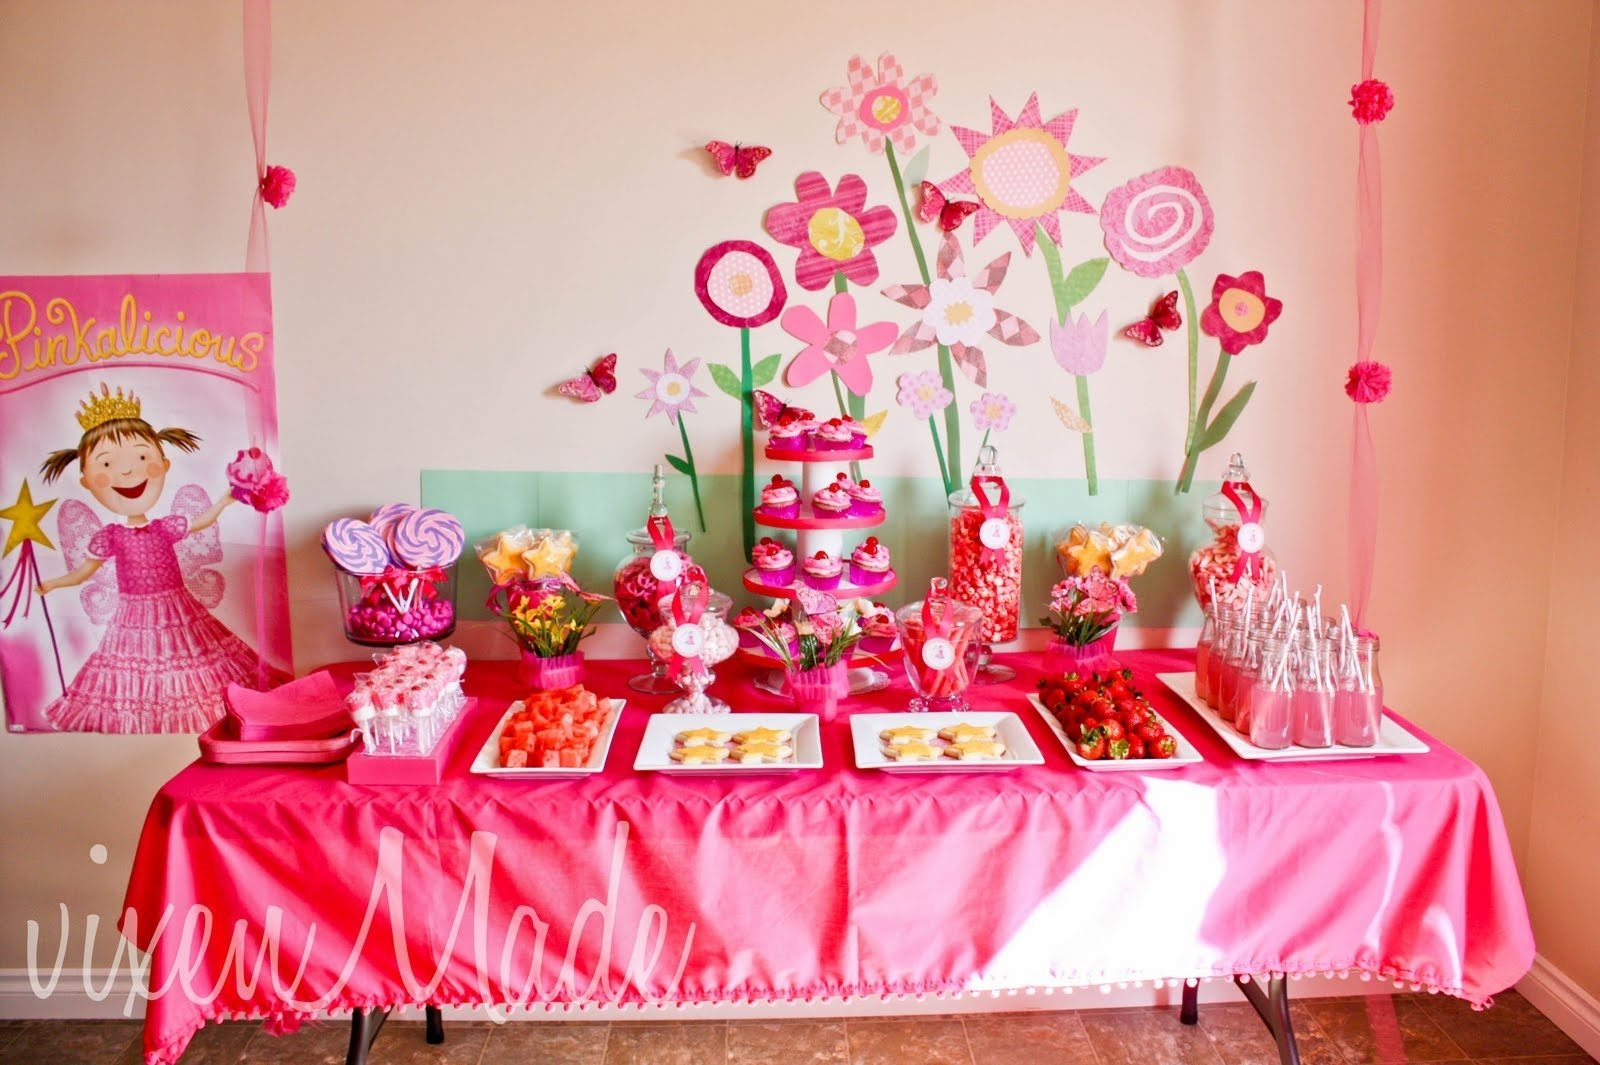 10 Pretty 6Th Birthday Party Ideas For Girls 6th birthday party ideas for girls 50 sweet girls party ideas 2020